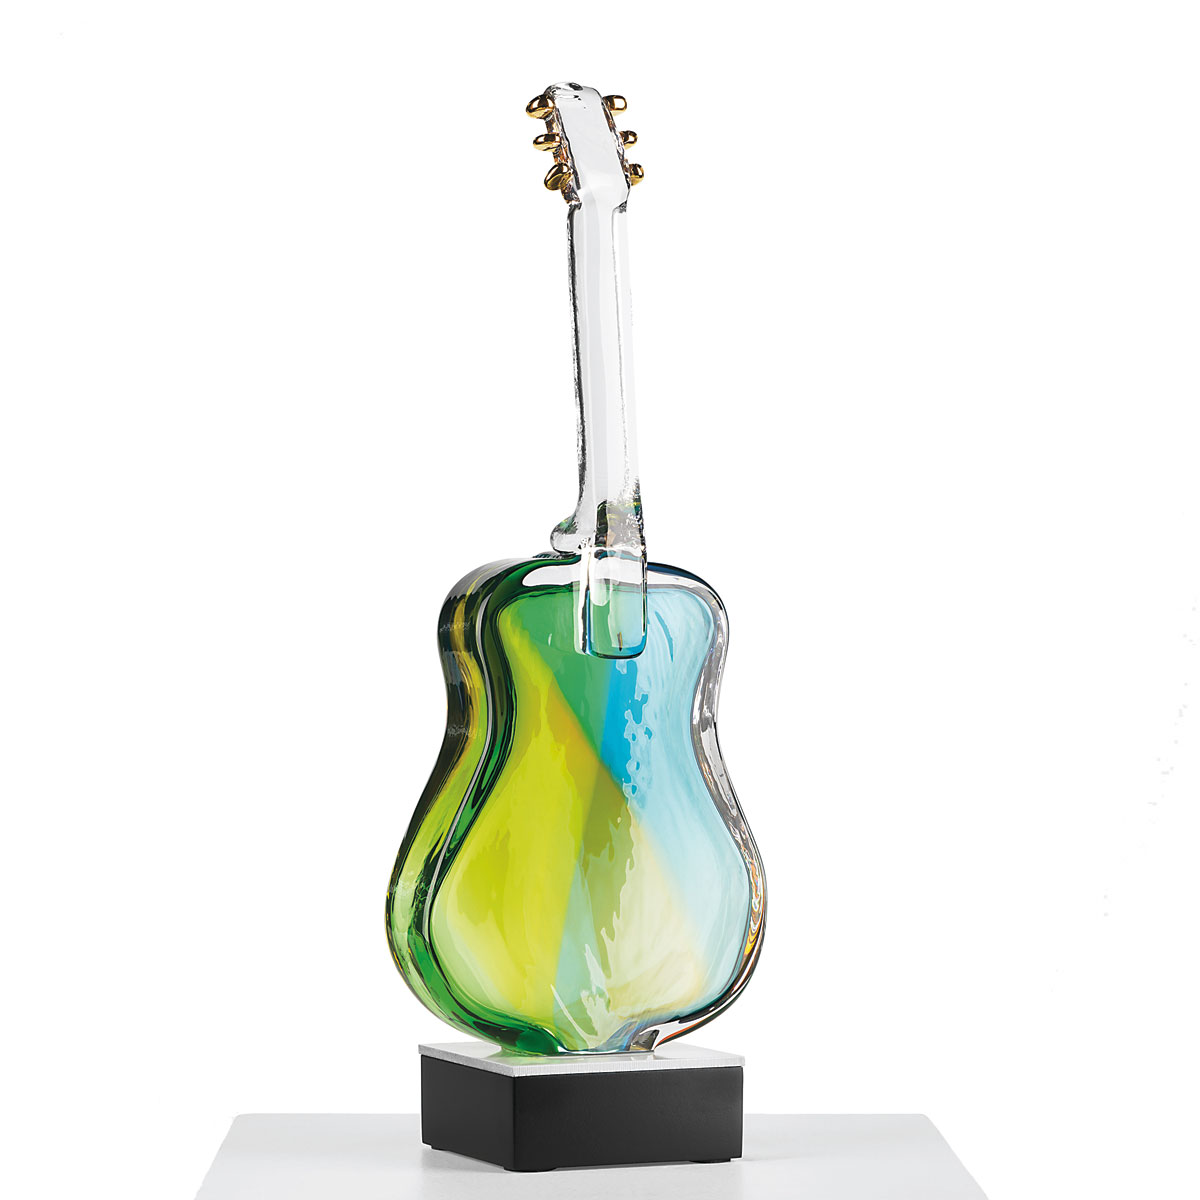 Kosta Boda Art Glass Kjell Engman Colorful Music Limited Edition of 60